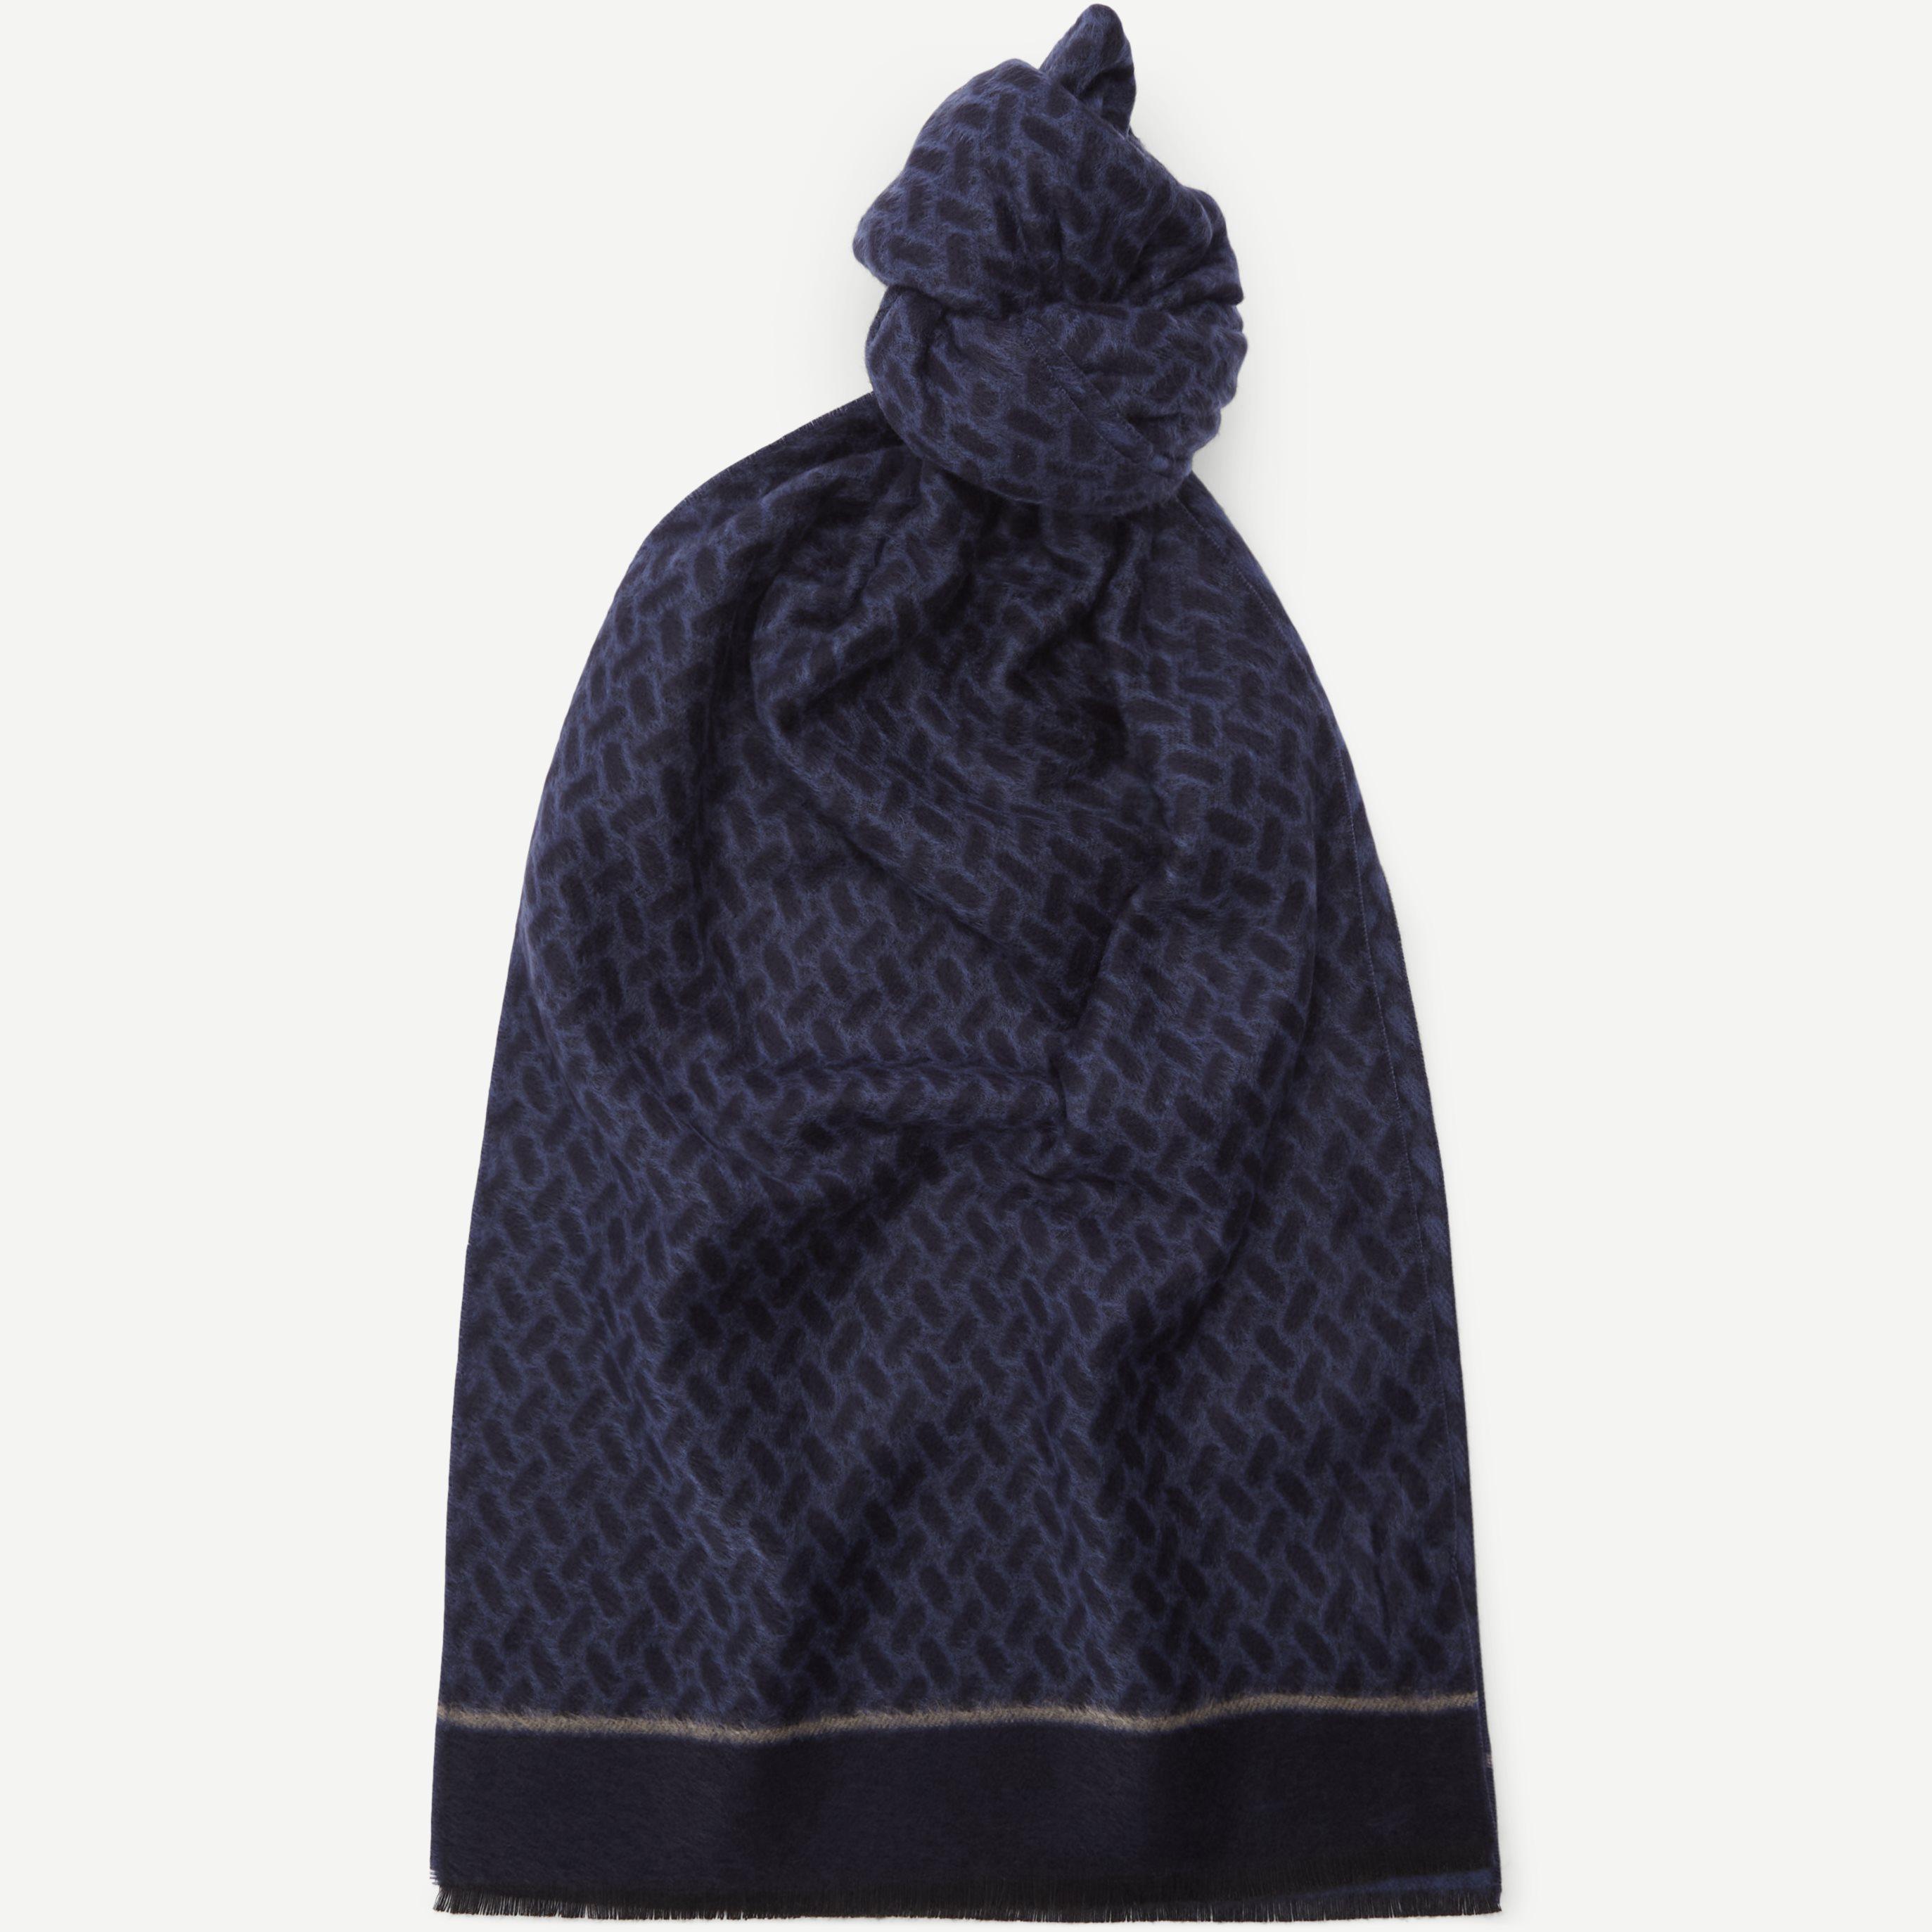 Oviedo Halstørklæde  - Halsdukar - Blå